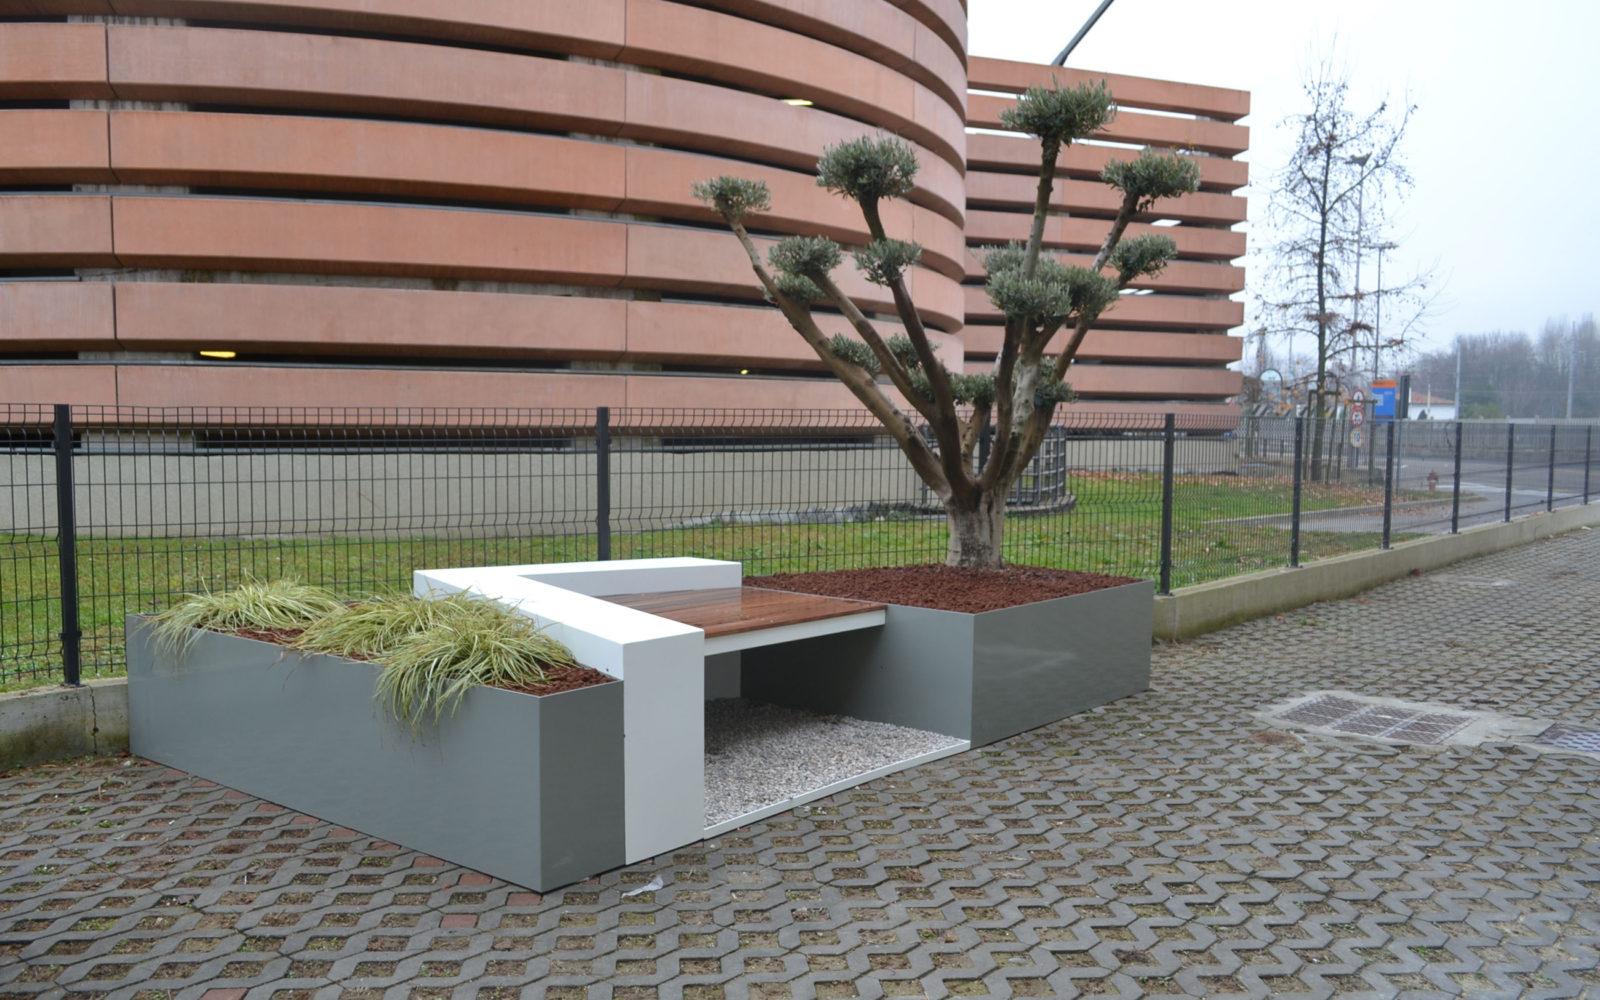 giardino fuori porta a Treviso - 1